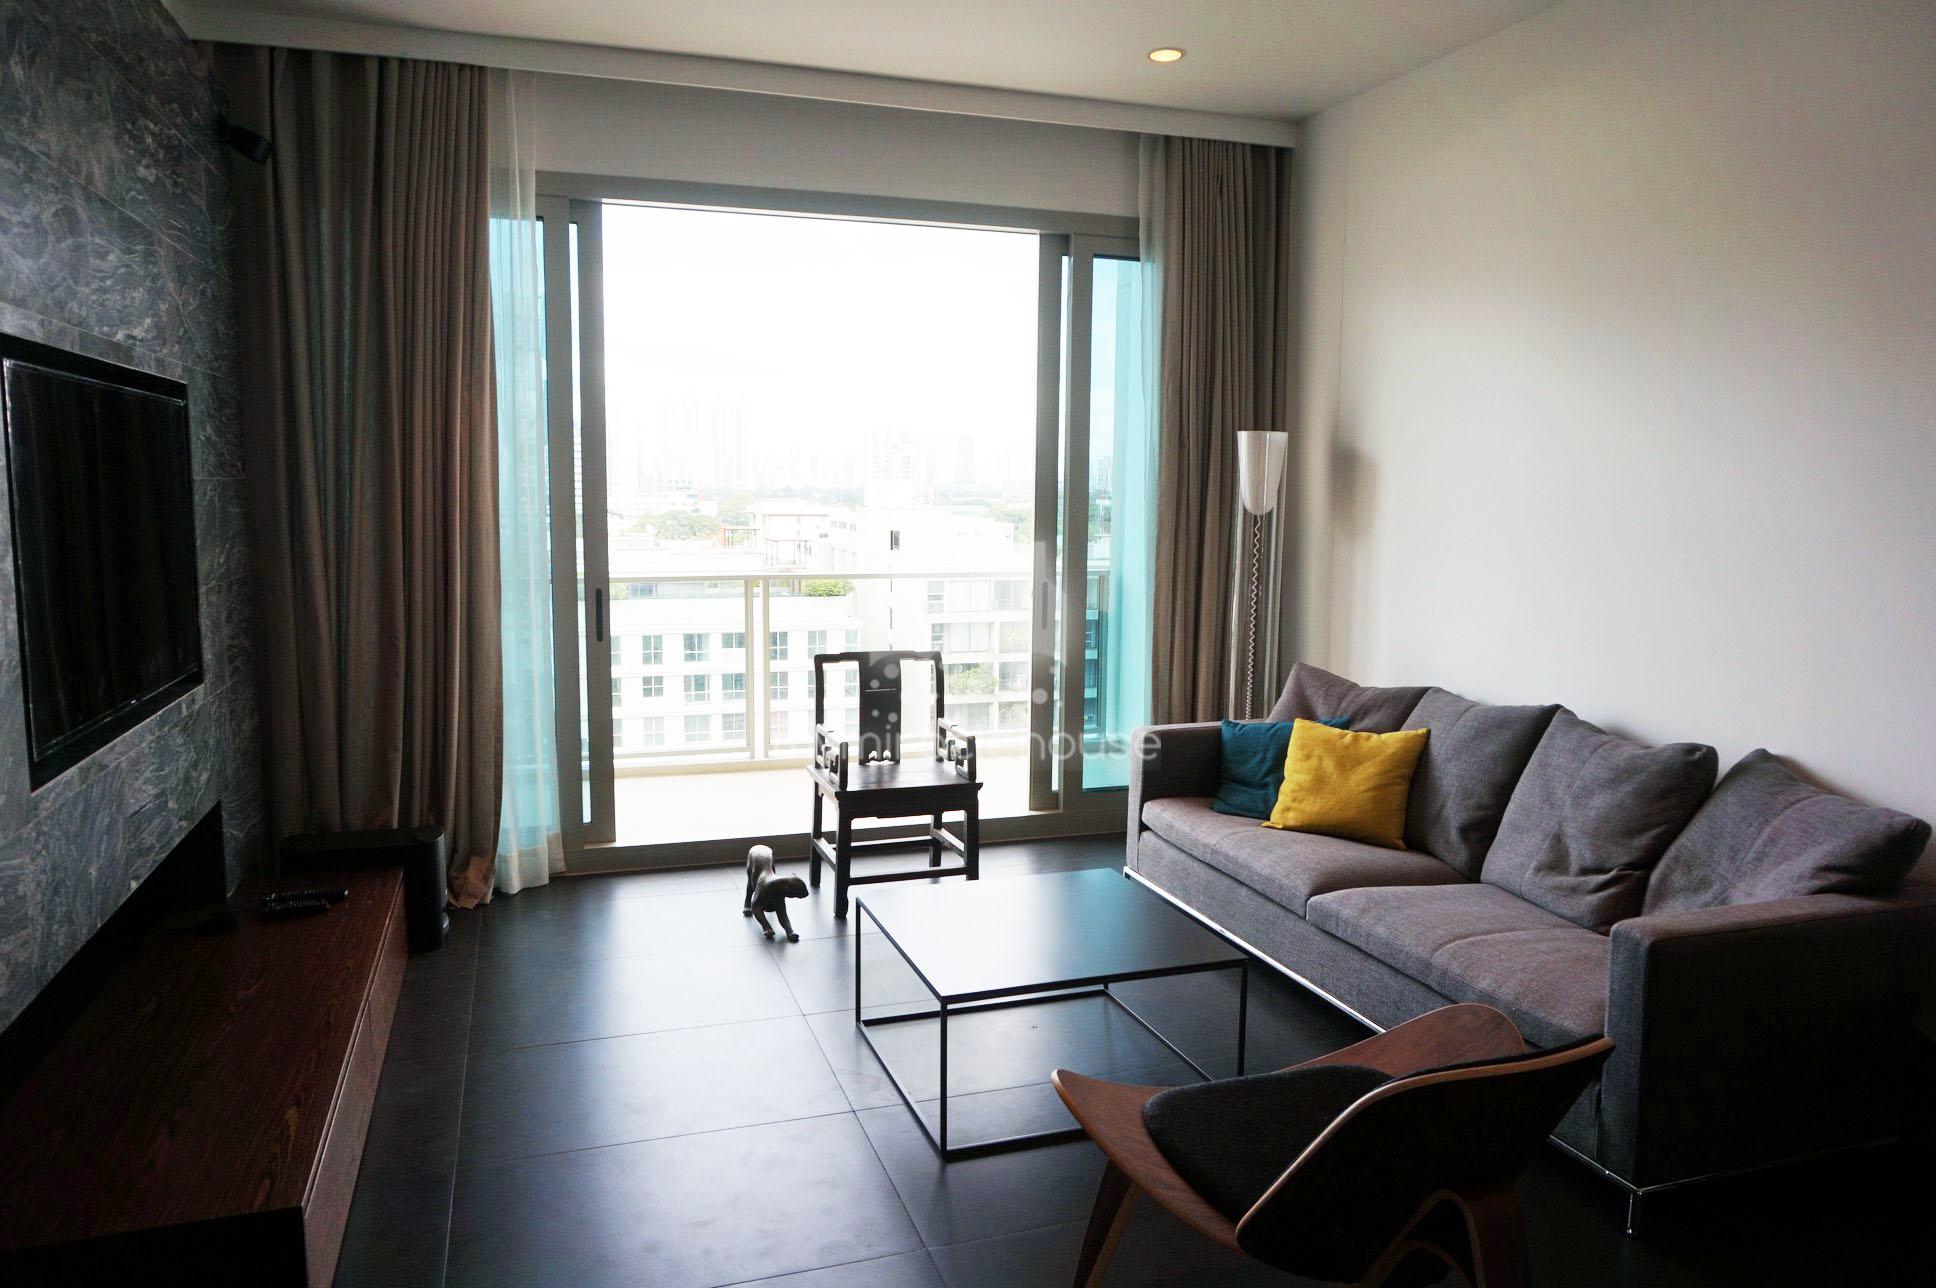 2 Bedroom Condo for rent in 185 Rajadamri near BTS Rajdamri.